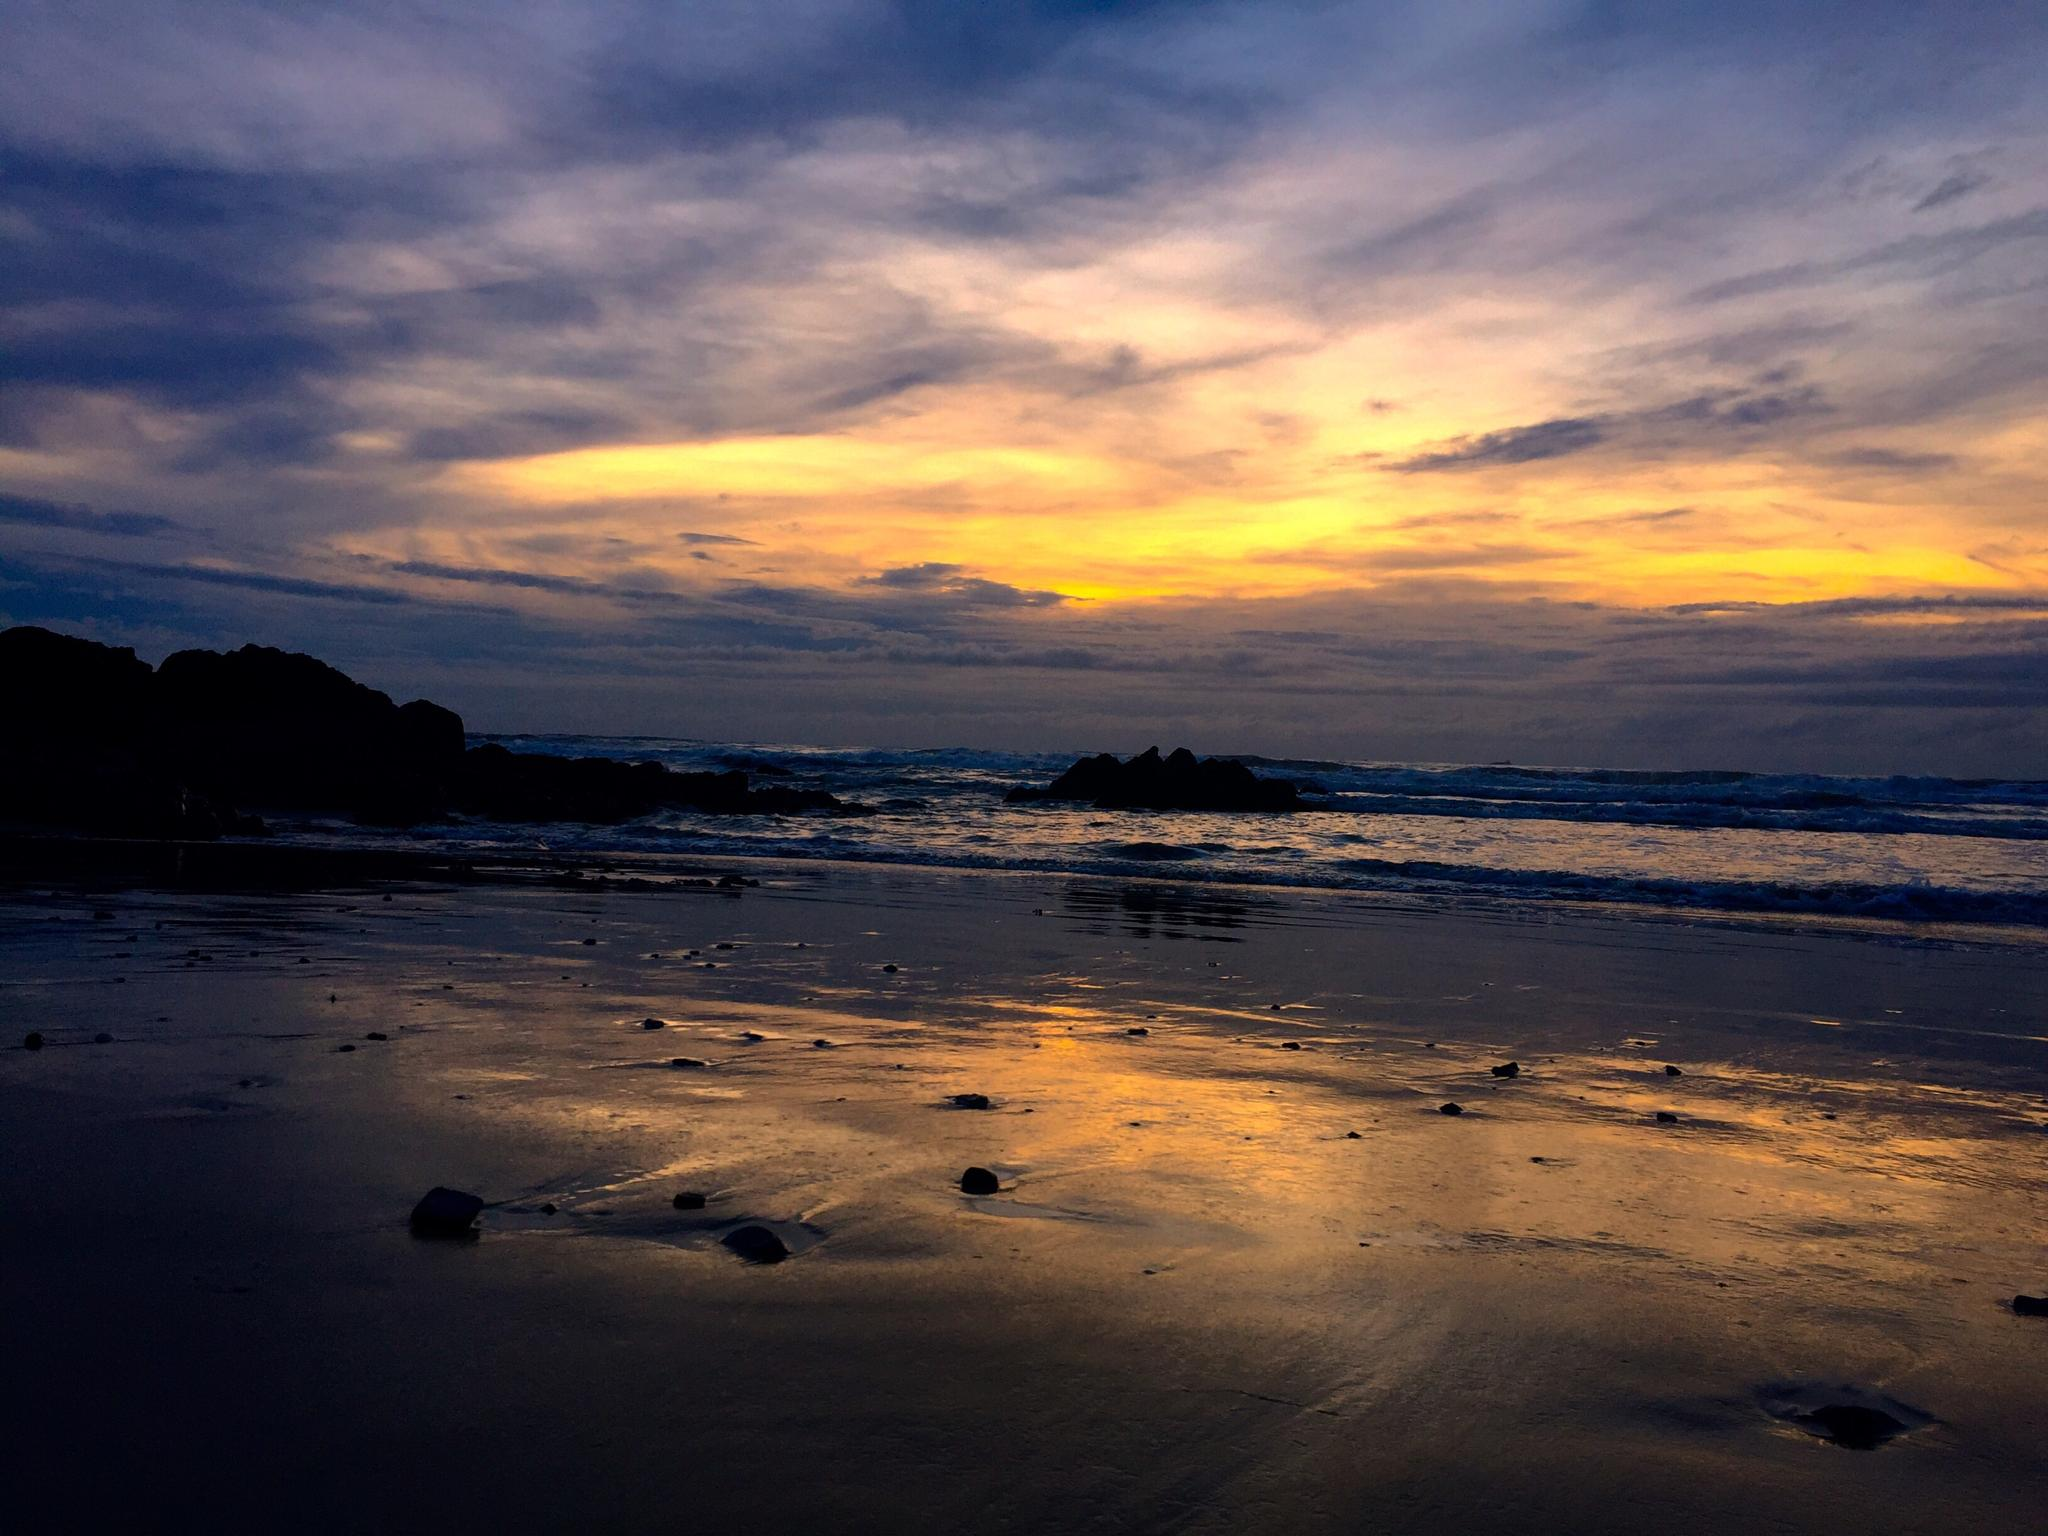 Sunrise in Nghingphong cap by Trinh Xuan Cuong